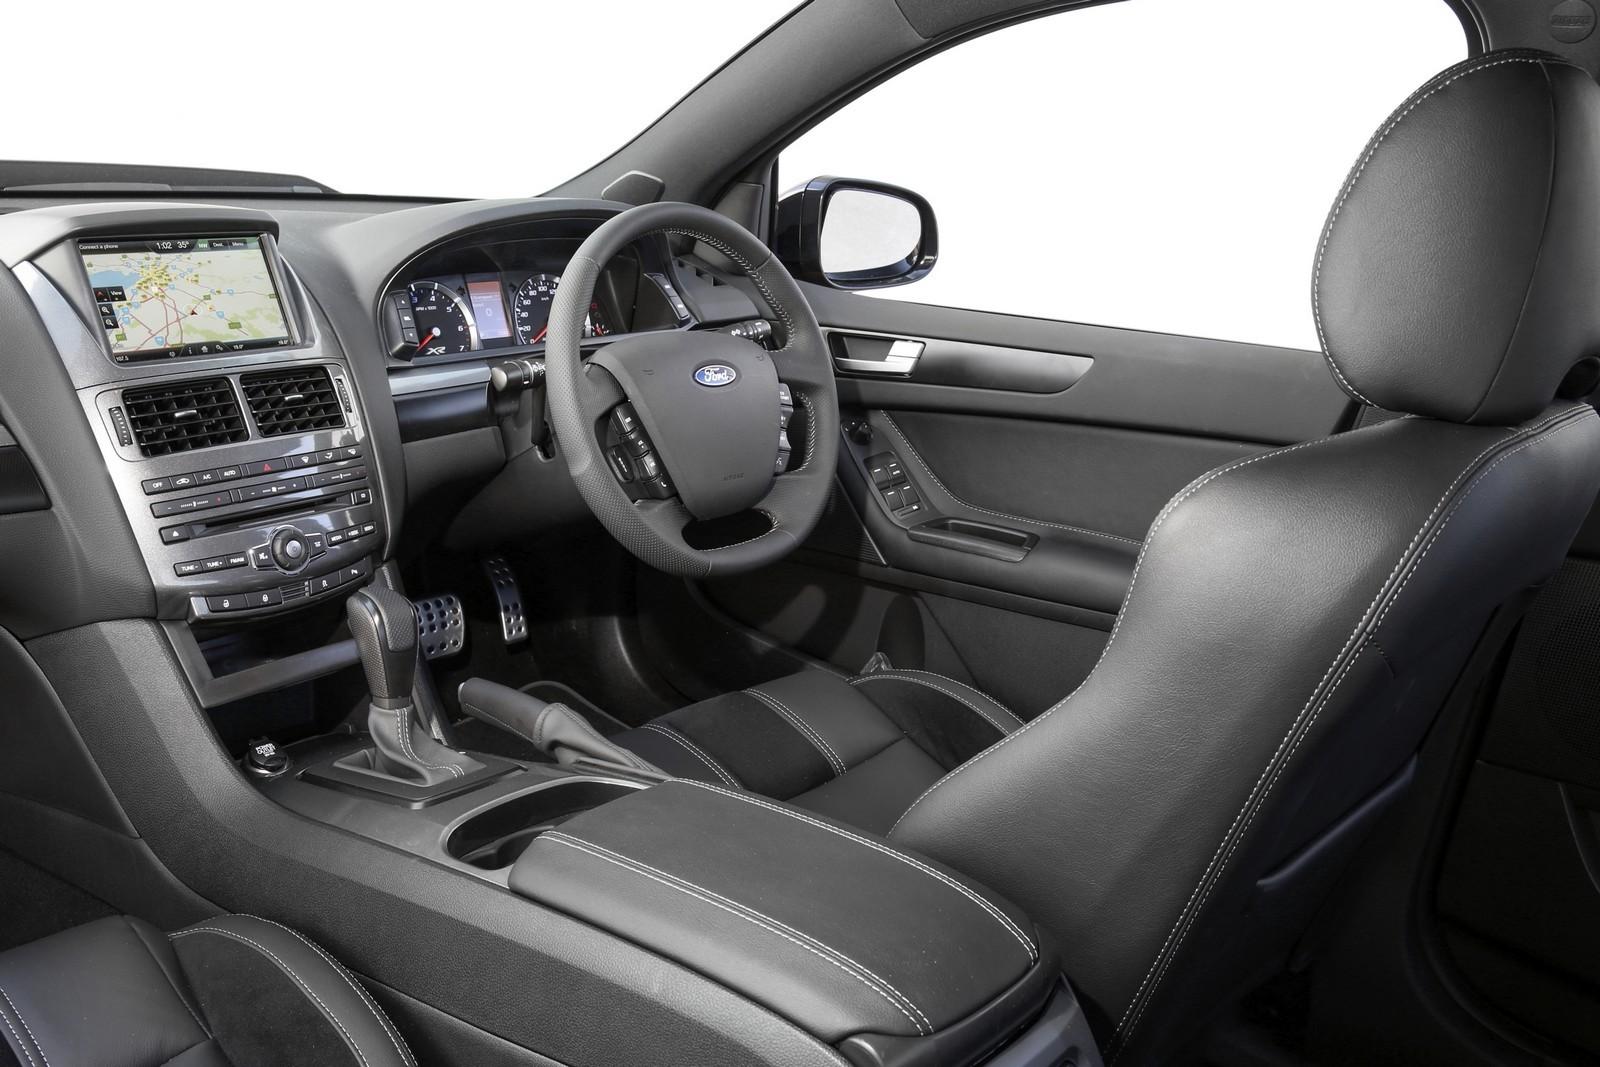 2016 Ford Falcon XR6 Turbo Sprint & XR8 Sprint Make Online Debut